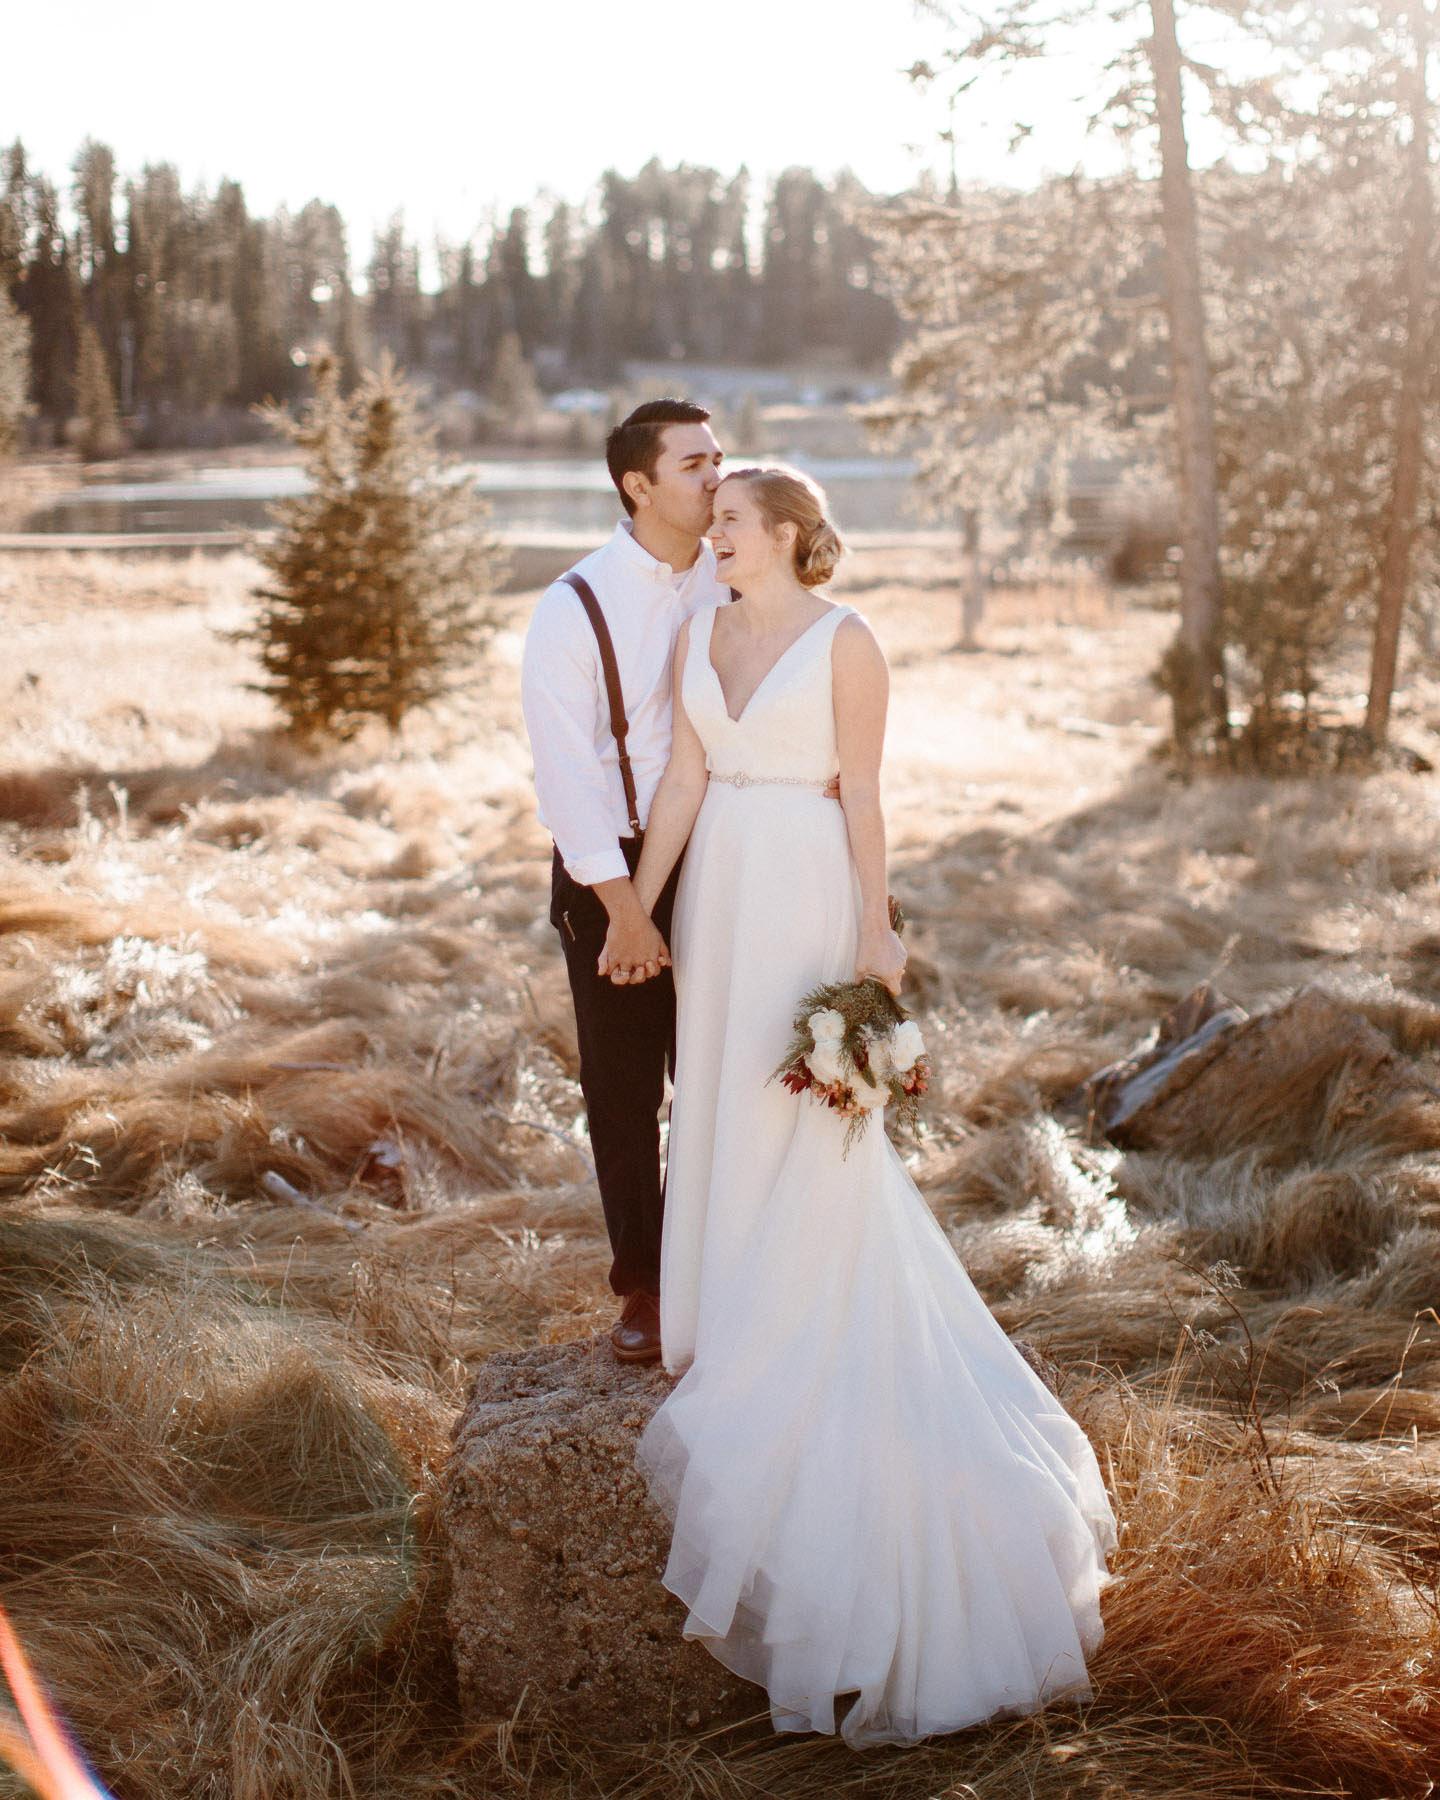 sioux-falls-black-hills-rapid-city-elopement-wedding-adventure-photographer-custer-sylvan-lake-22.jpg